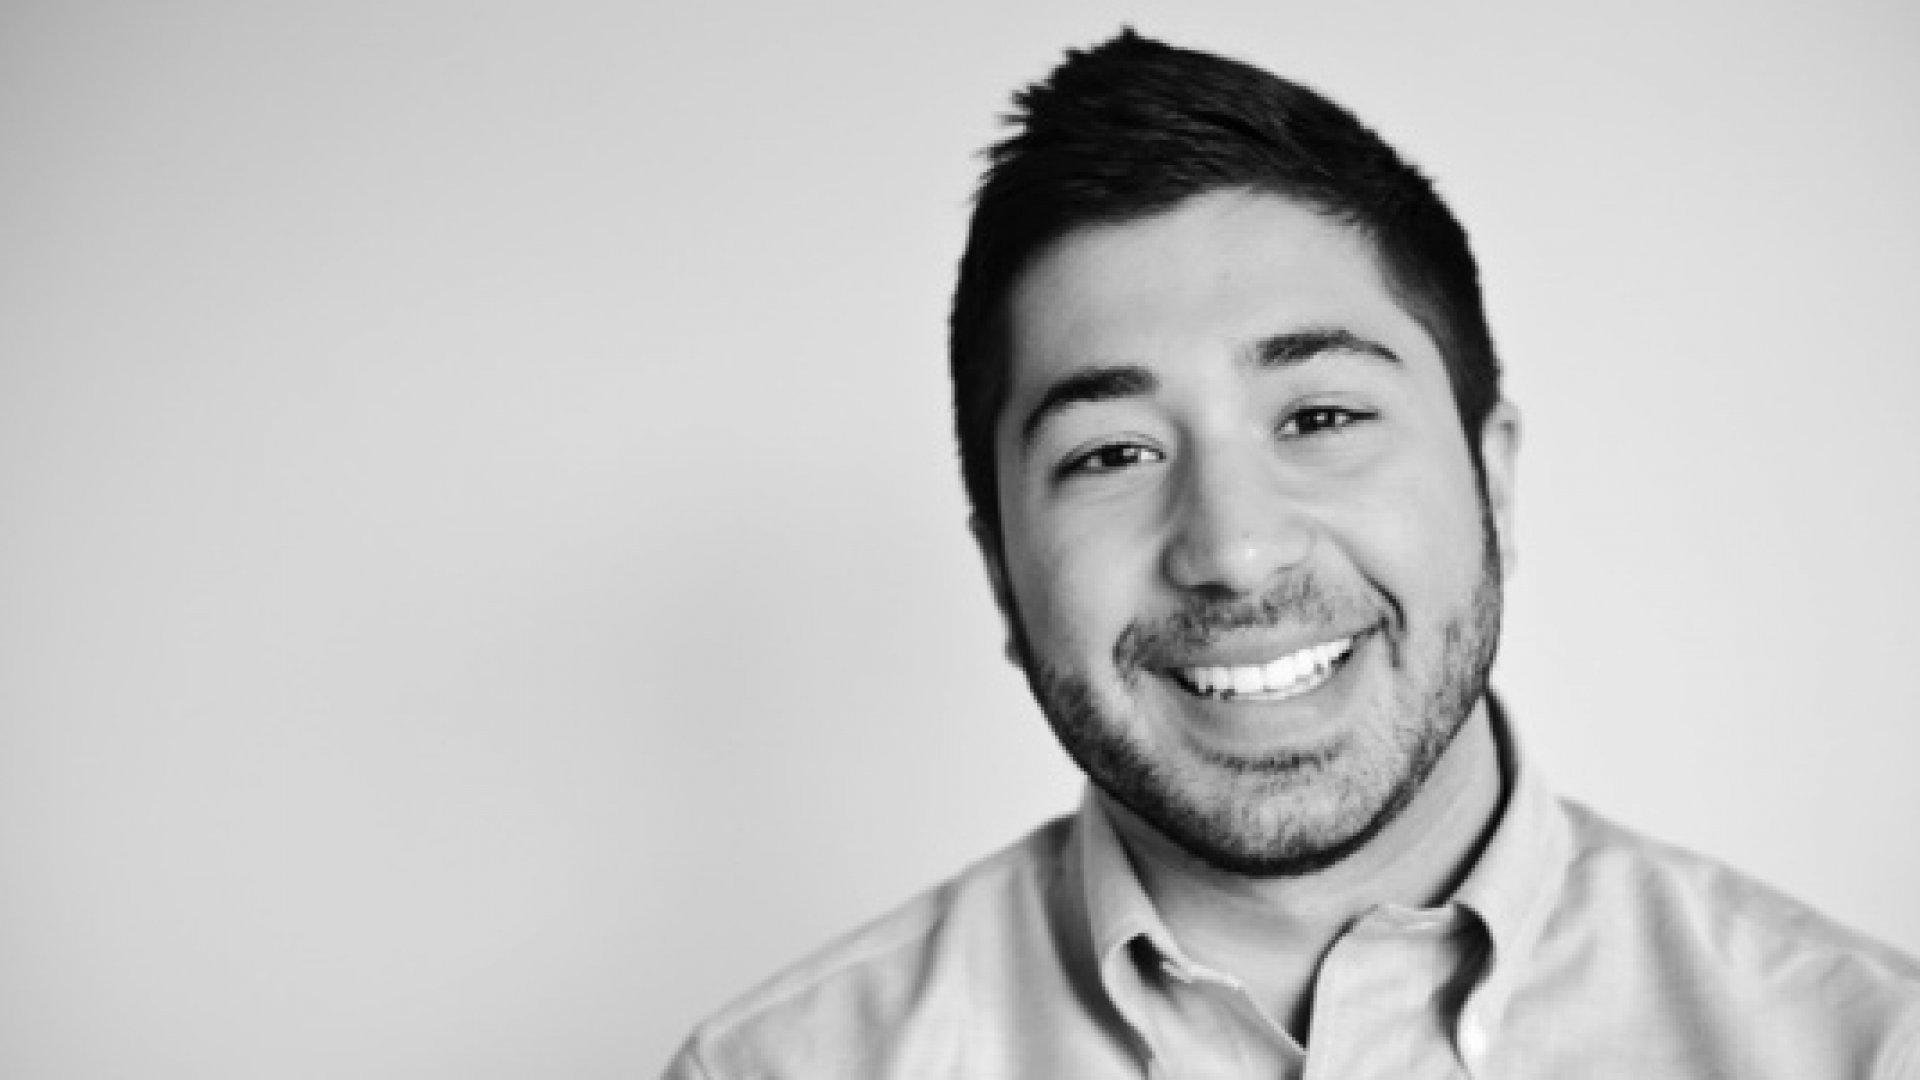 BlueBridge Digital founder Santiago Jaramillo